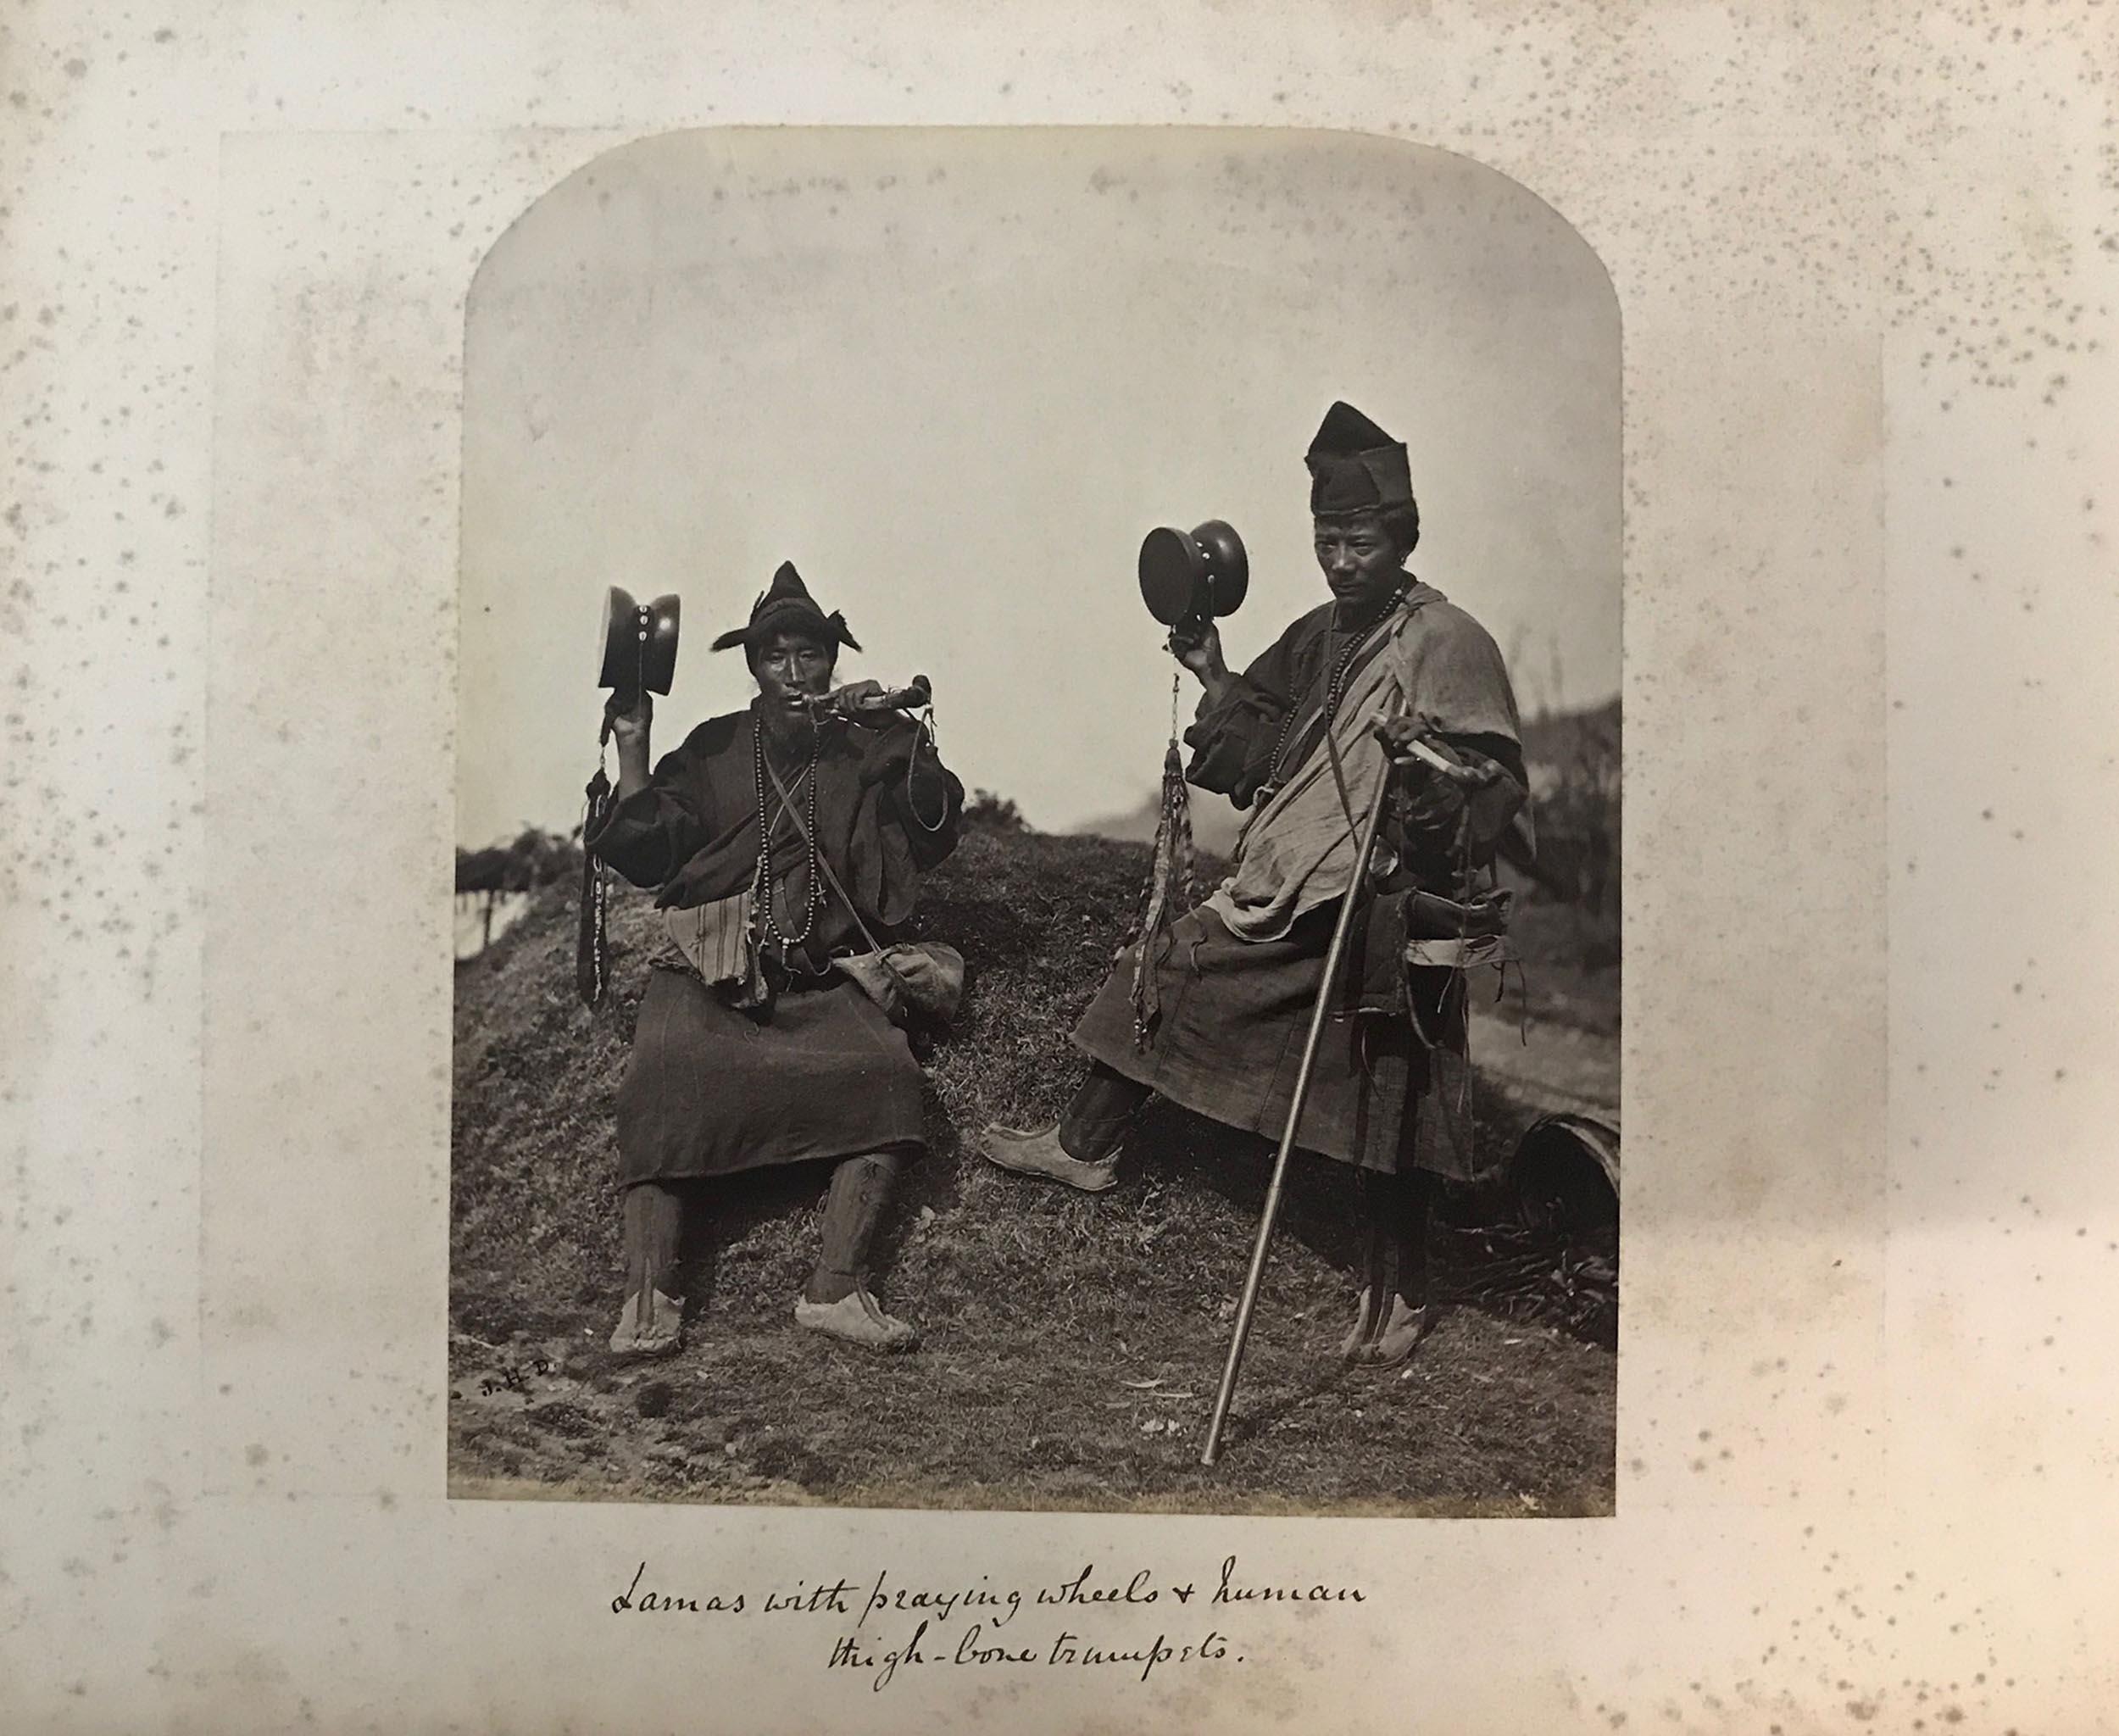 Photo Album: Views, India Tour. 1881 - Samuel Bourne